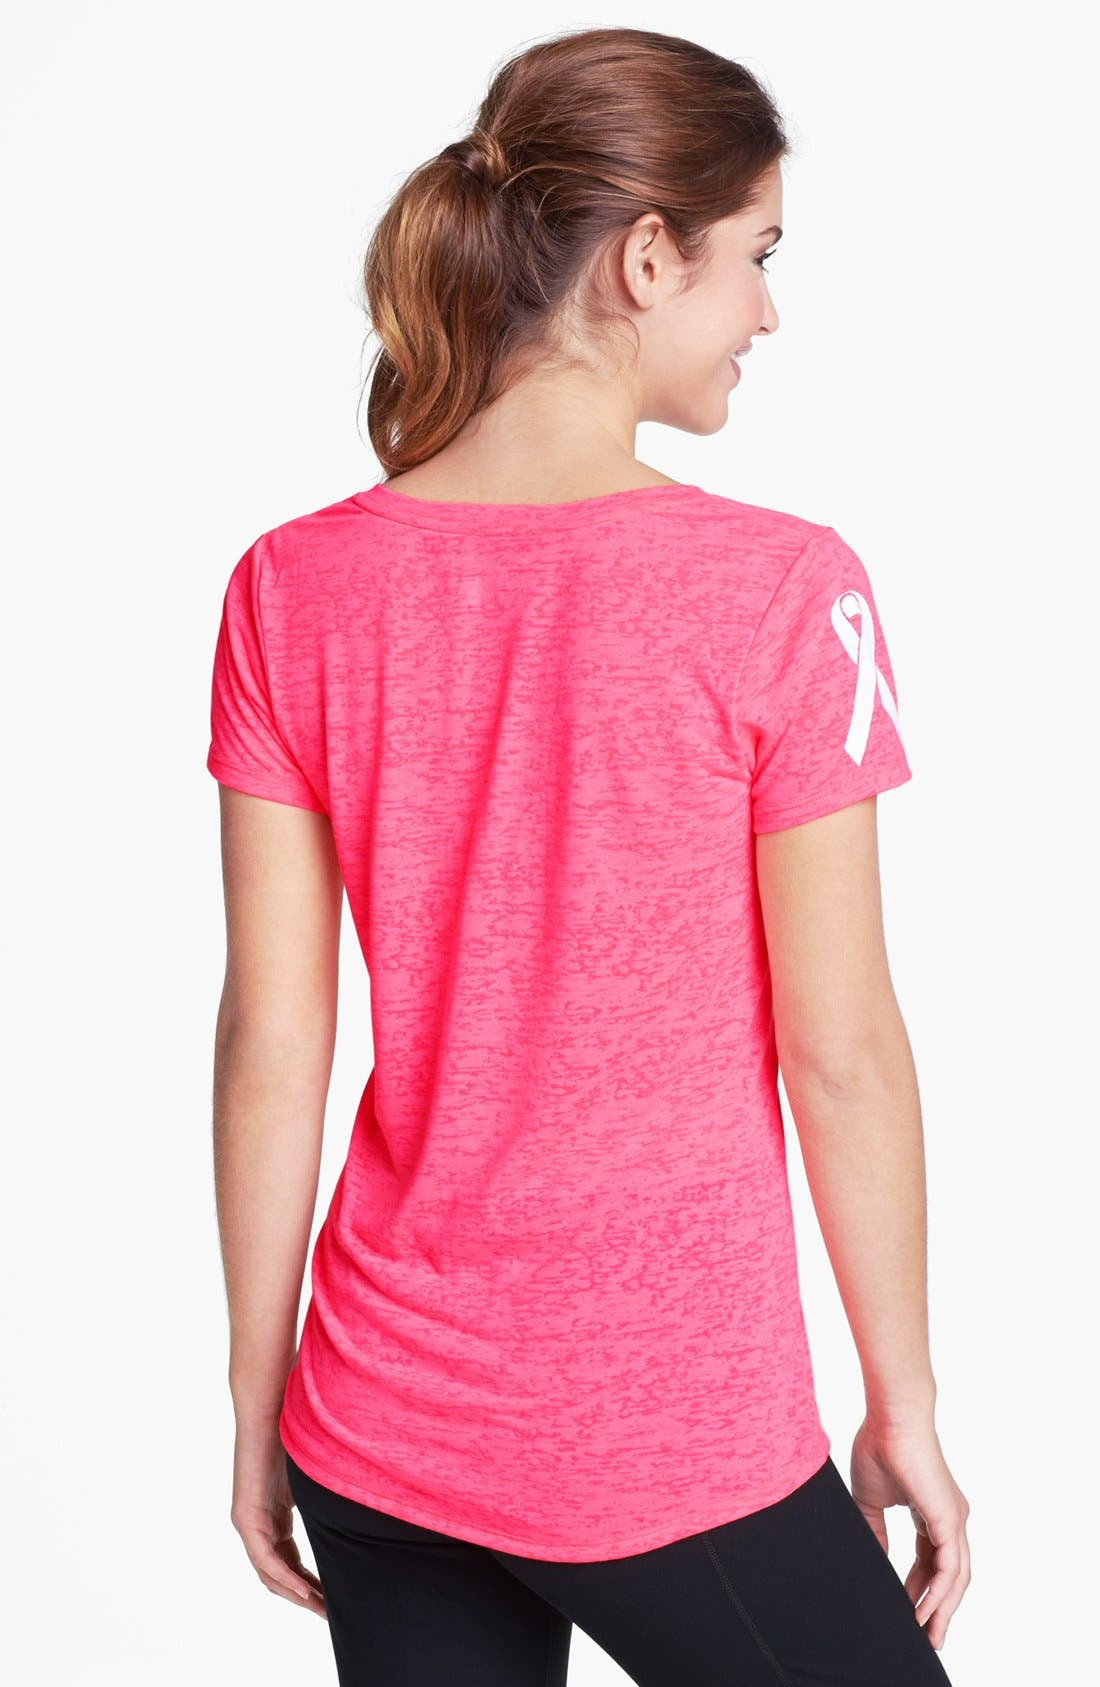 Alternate Image 2  - Under Armour 'Power in Pink Achieve' Tee